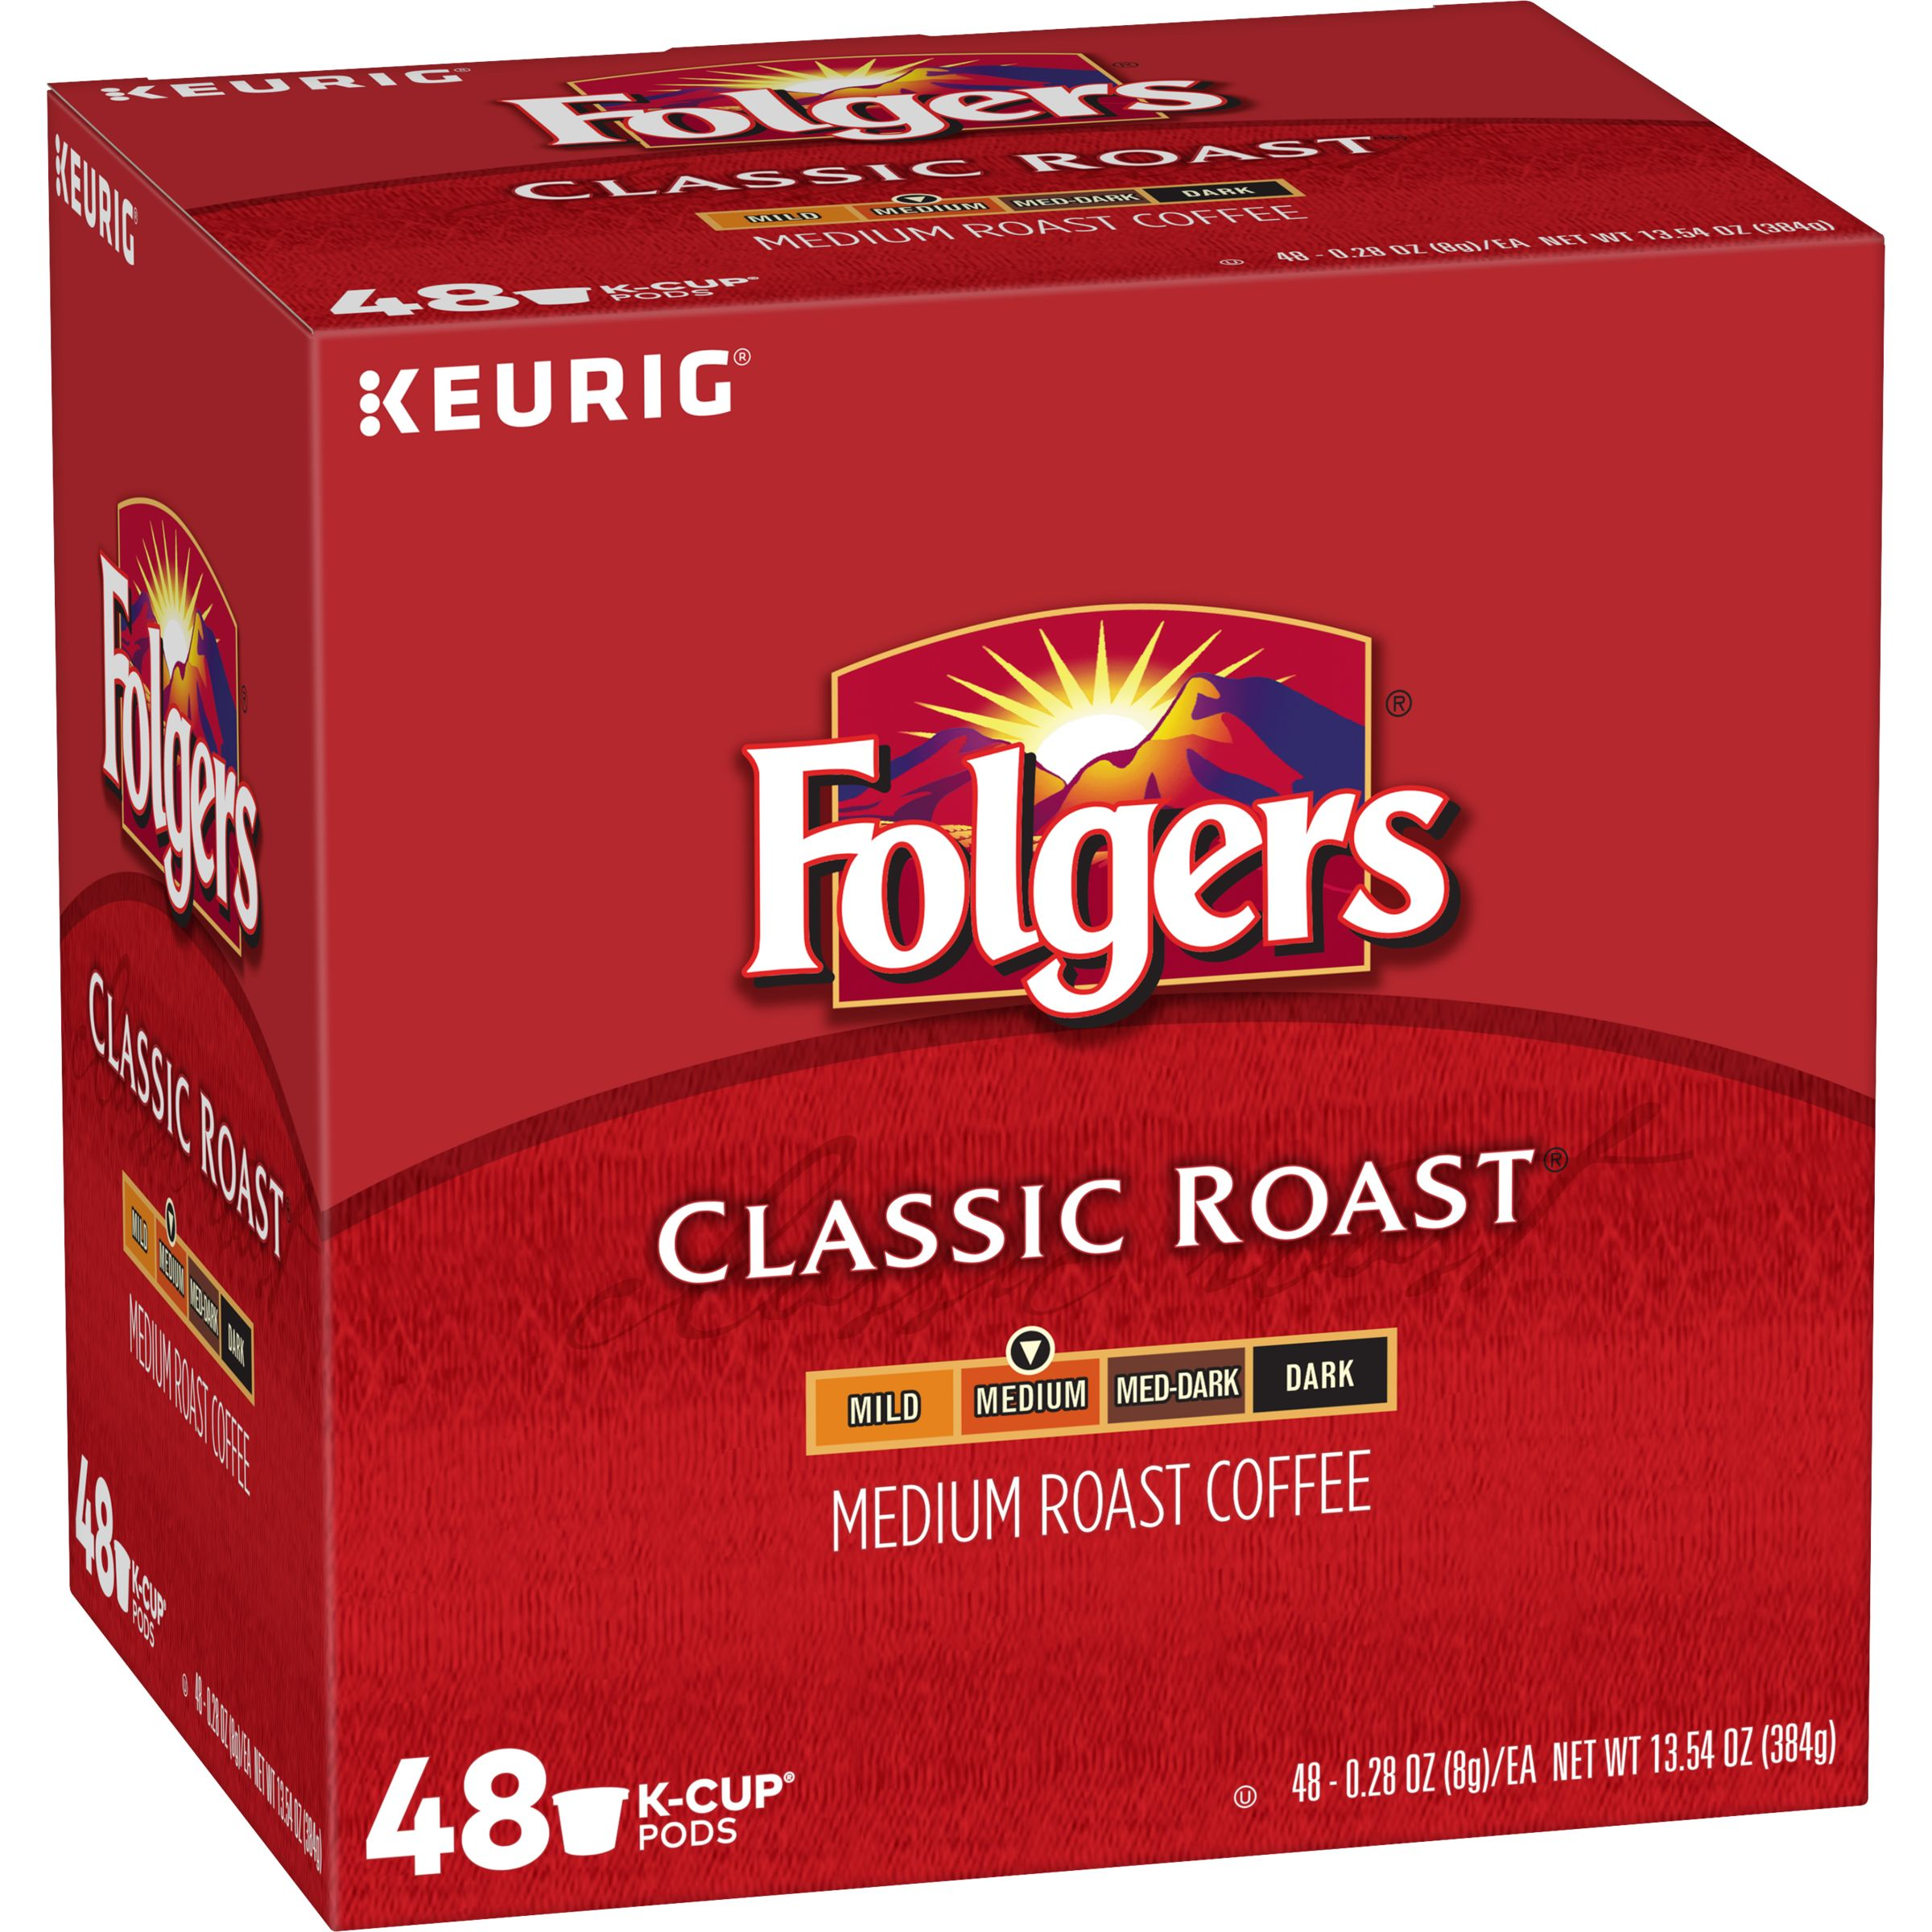 Folgers Classic Roast, Medium Roast Coffee, K-Cup Pods, 48-Count